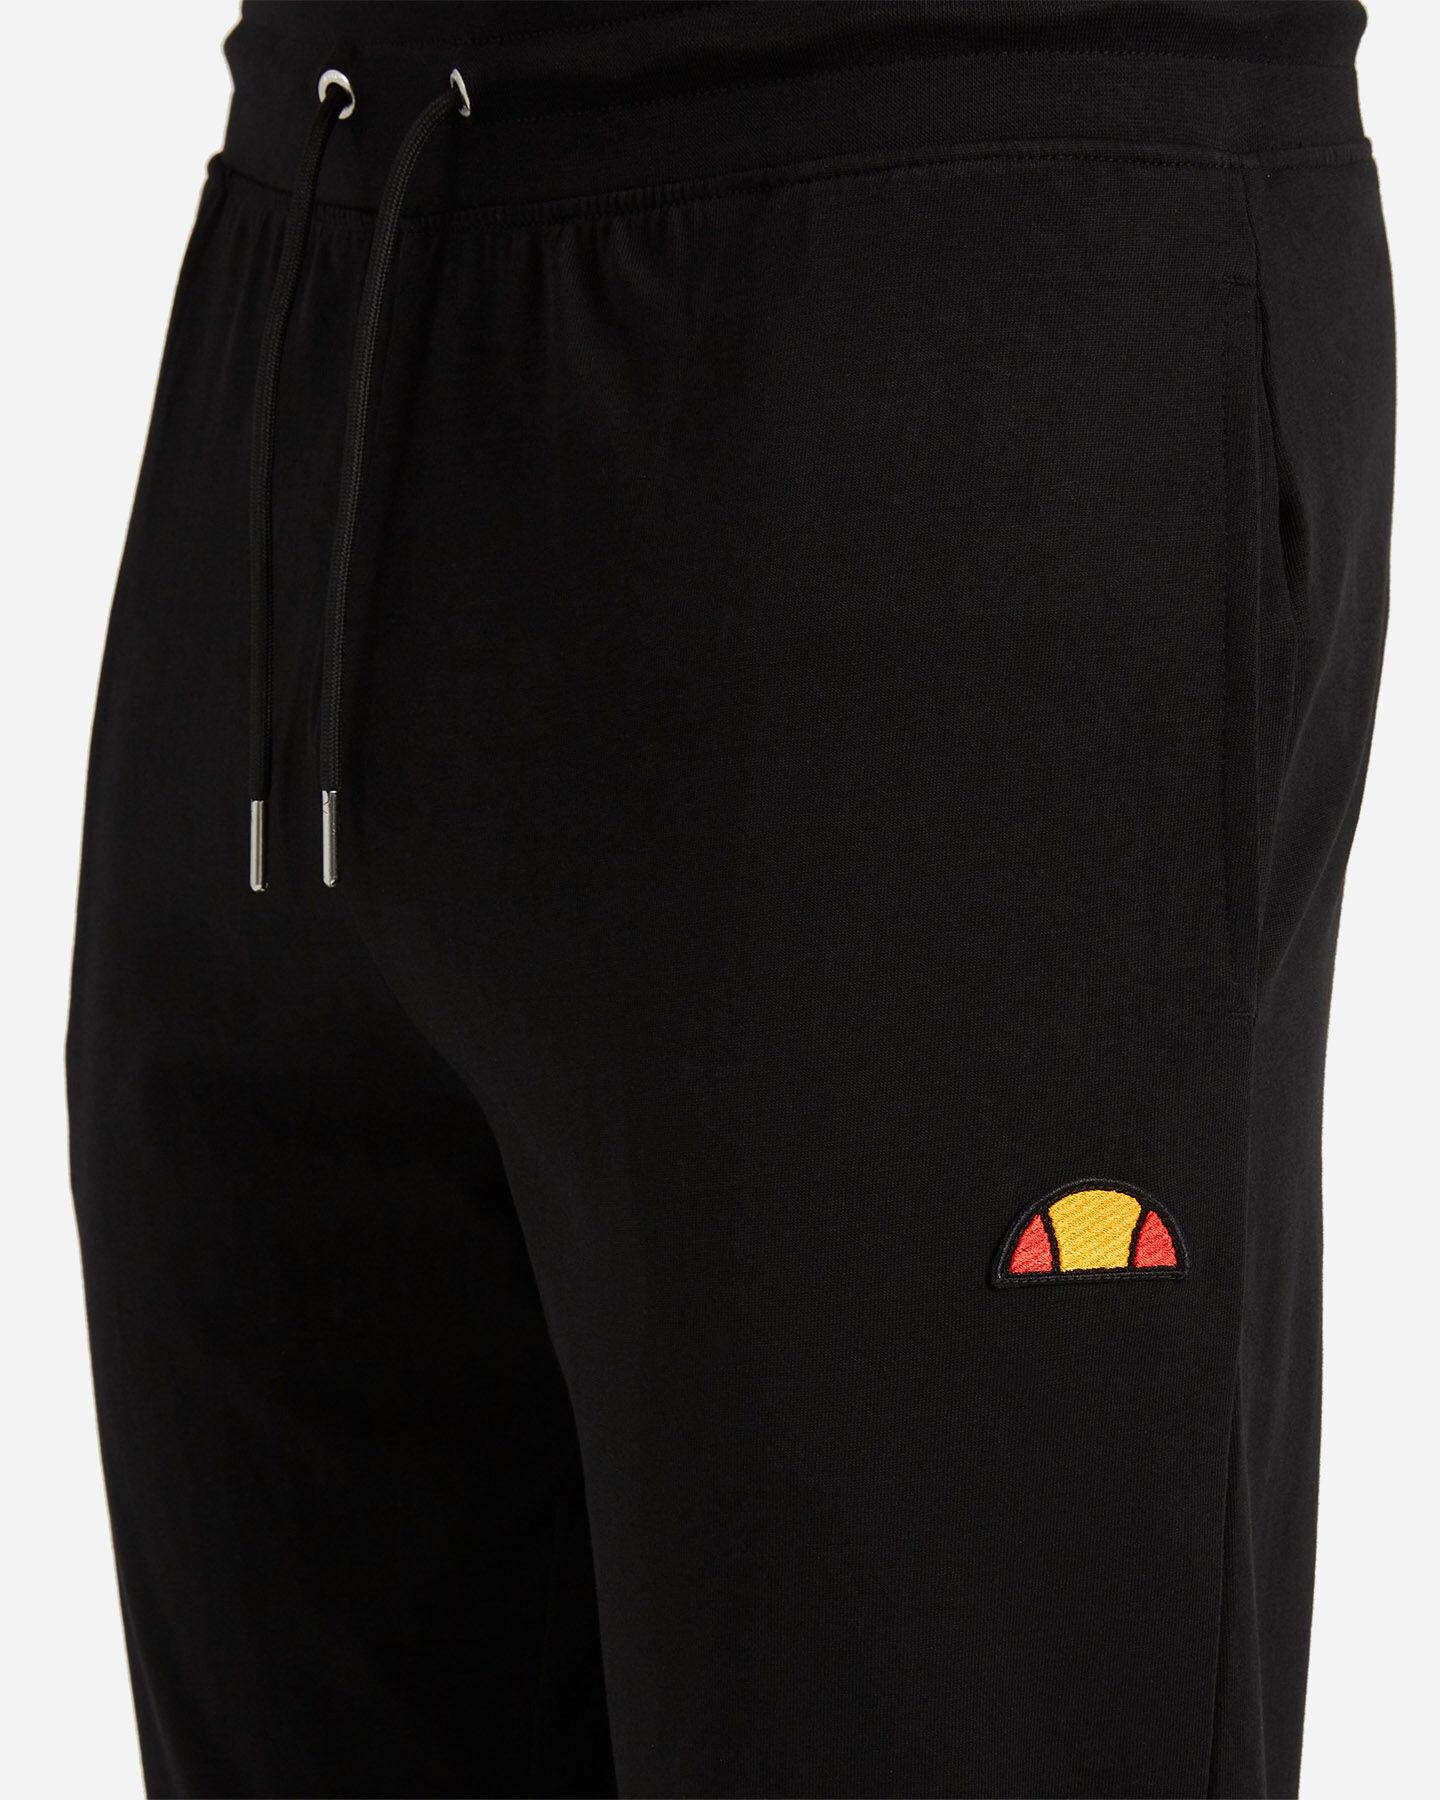 Pantalone ELLESSE BASIC M S4087821 scatto 3